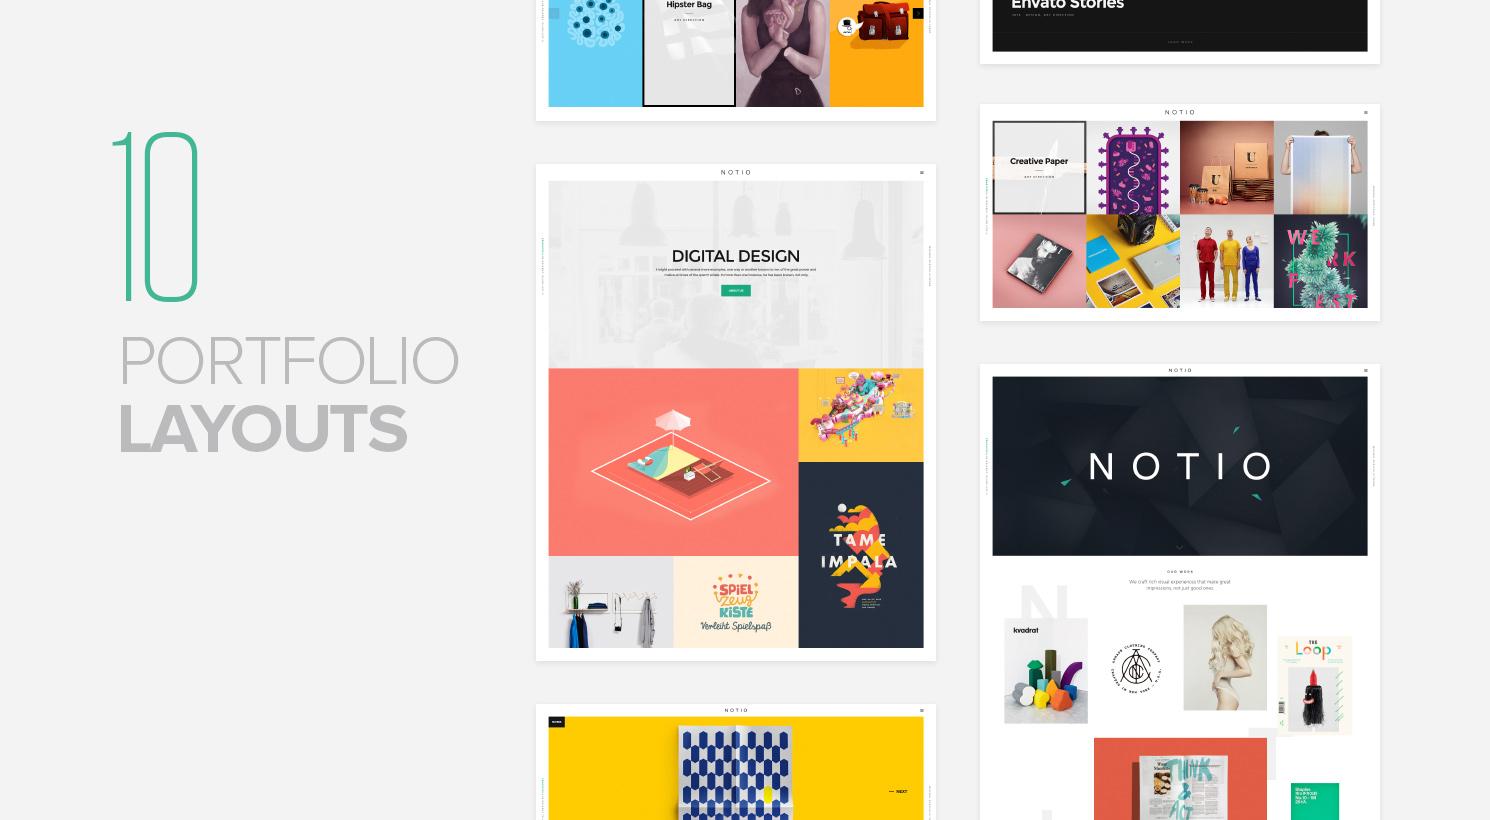 Notio - Deluxe Portfolio Theme